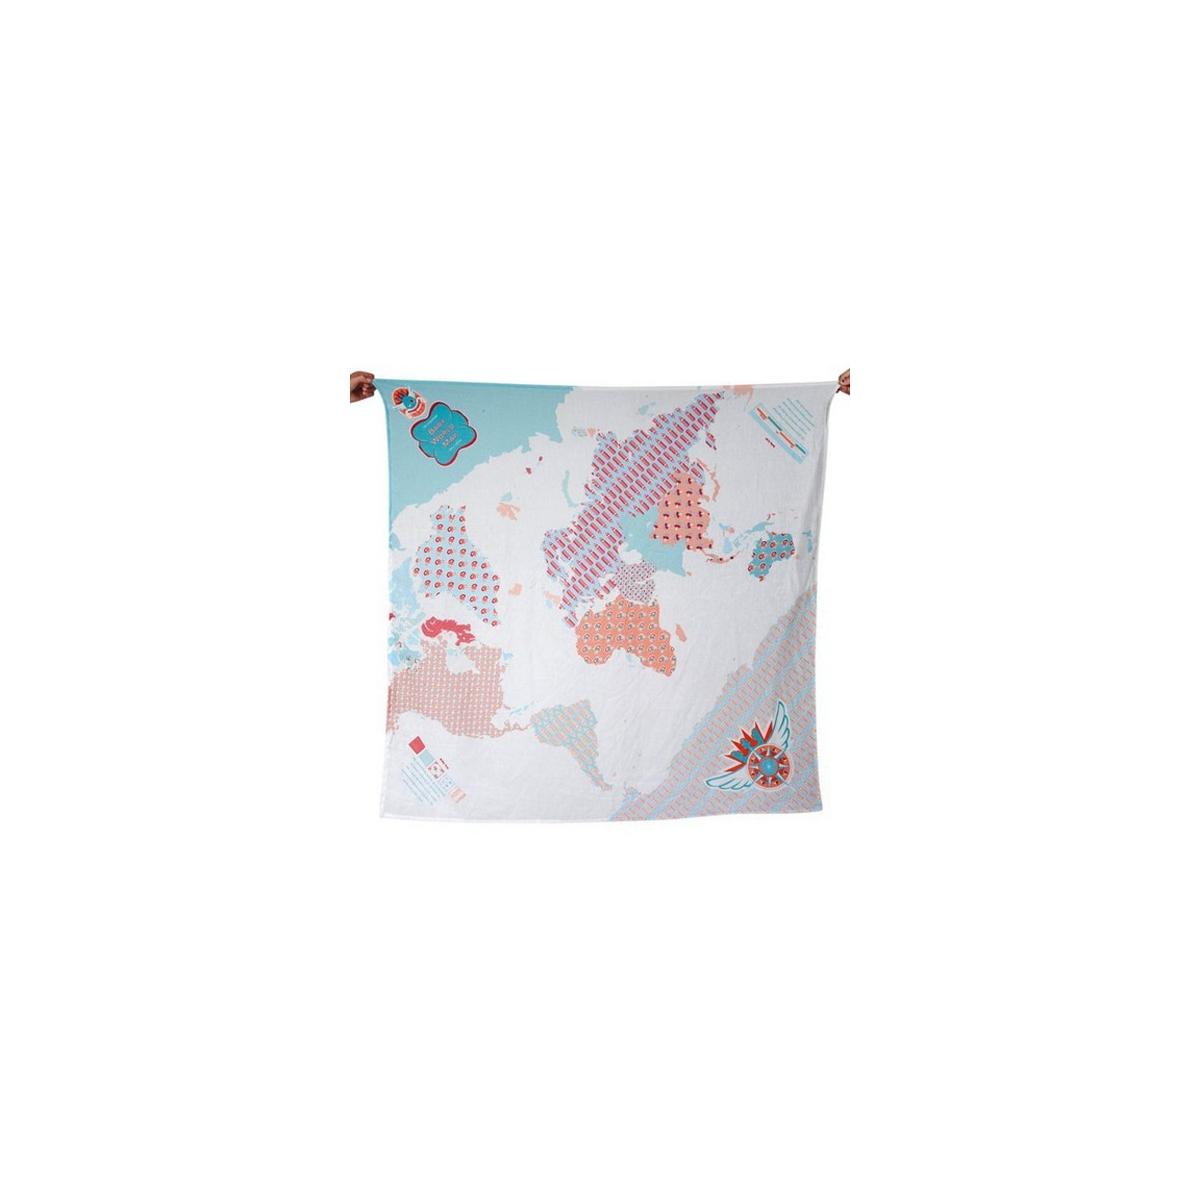 Weegoamigo Printed Muslin Wraps-World Map